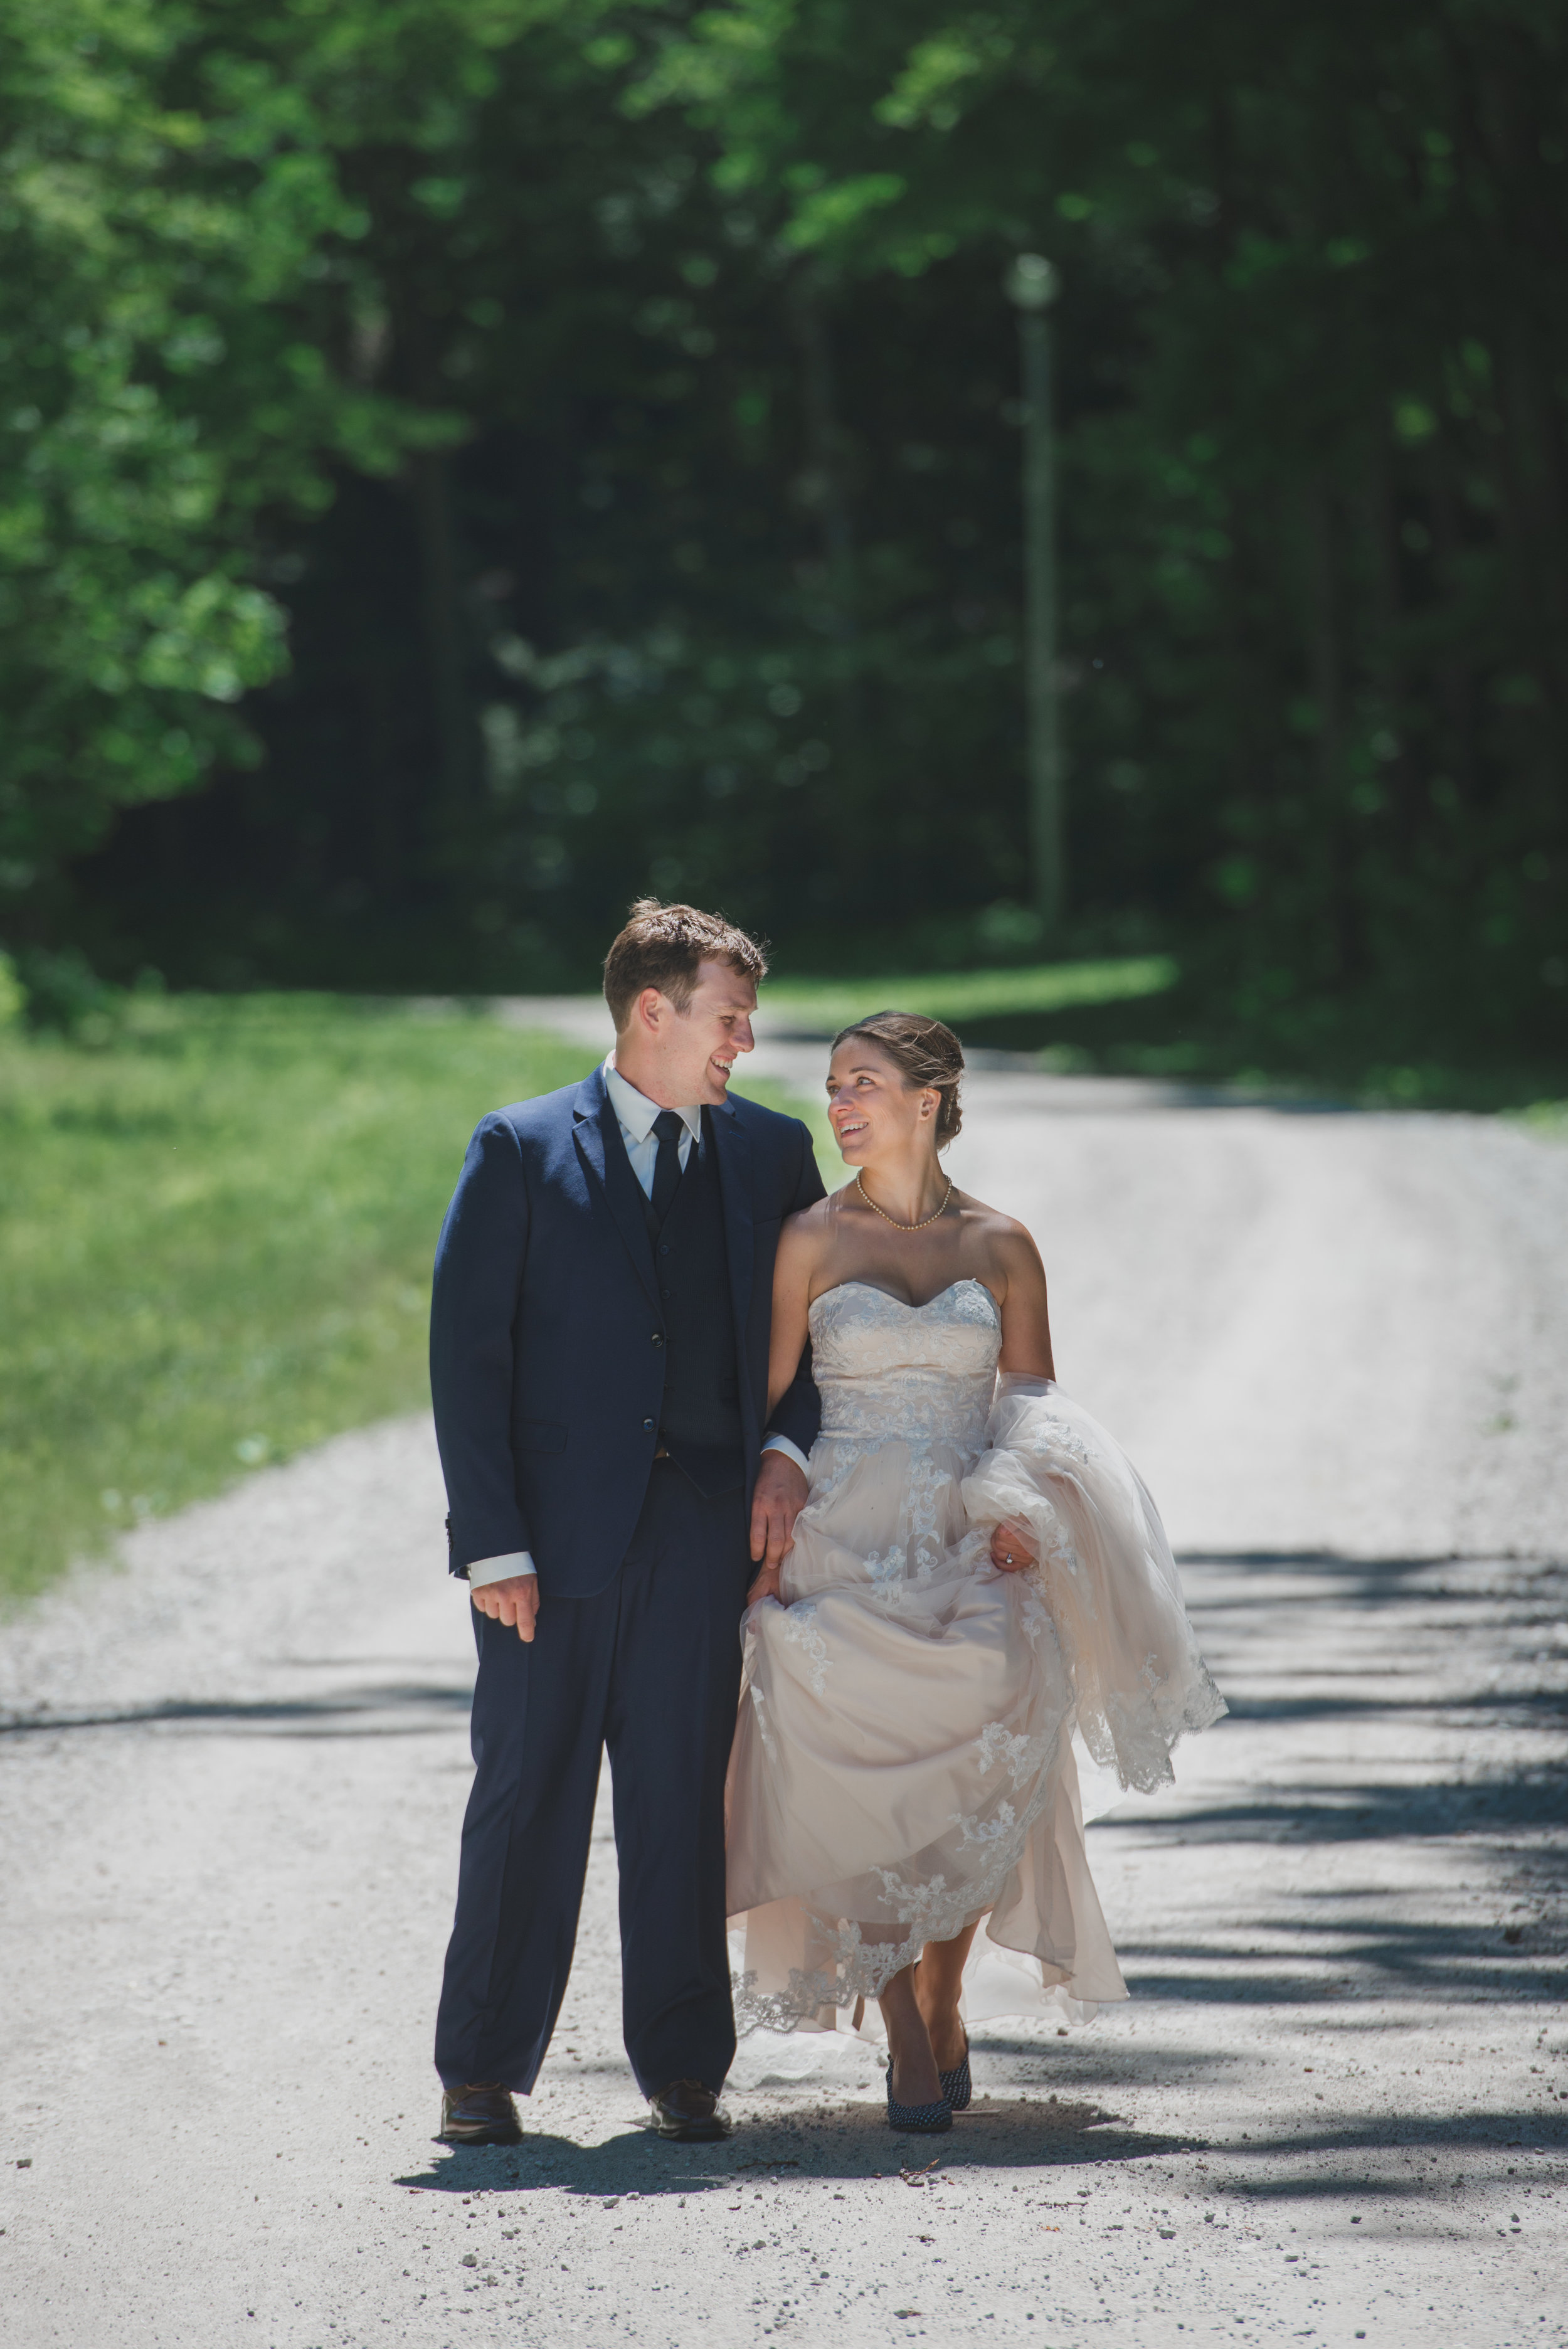 SheriCorey-Wedding-June242017-FirstLook-PortraitSession-00081.jpg